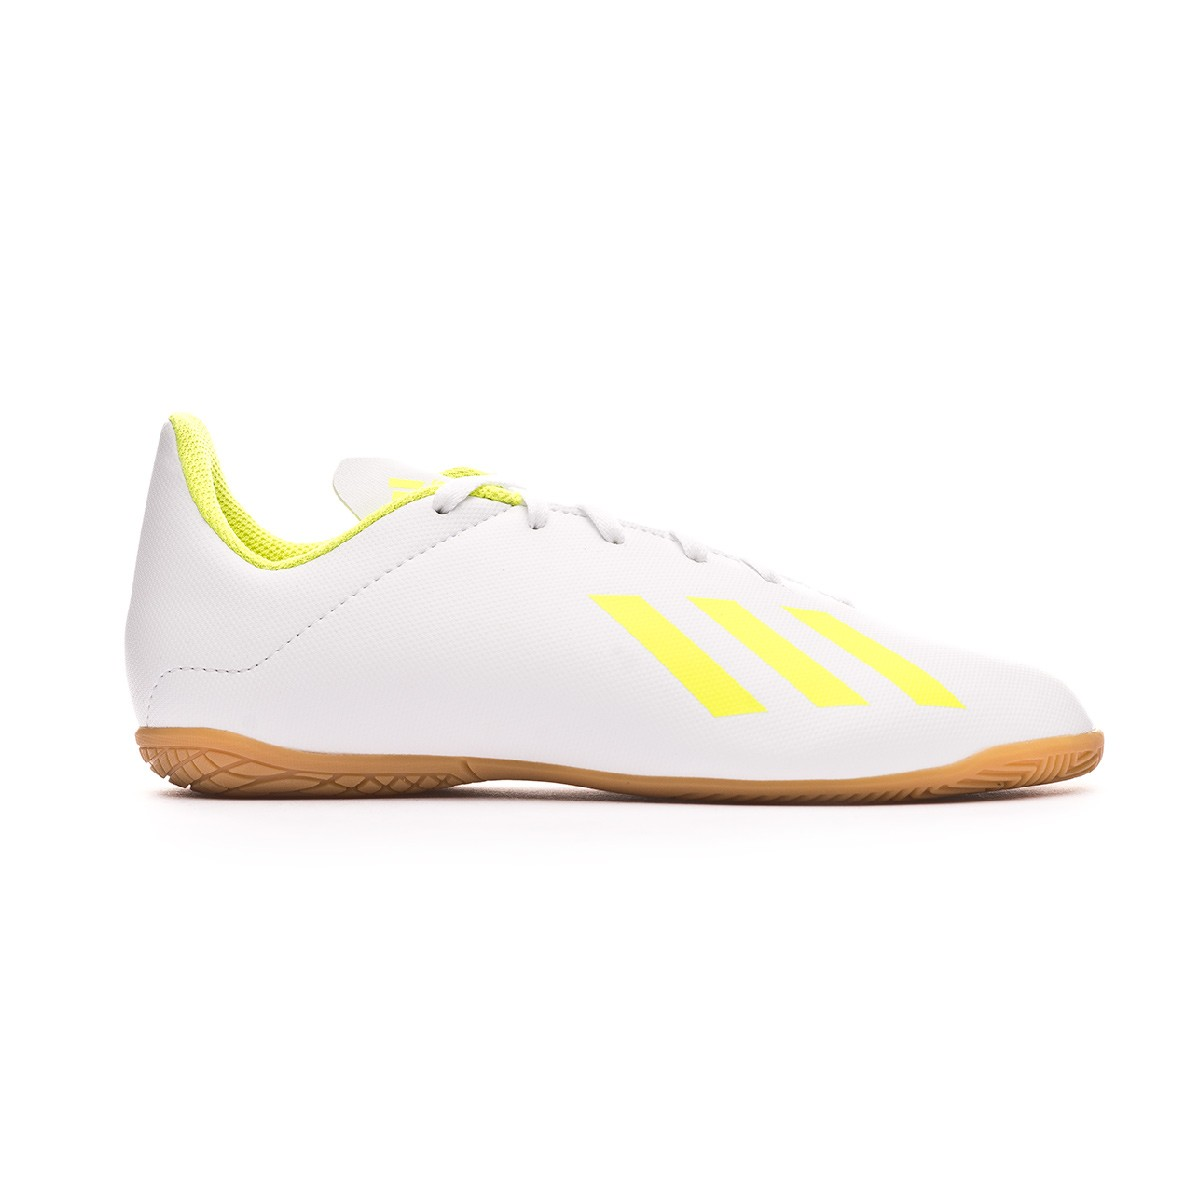 Sapatilha de Futsal adidas X 18.4 IN Crianças